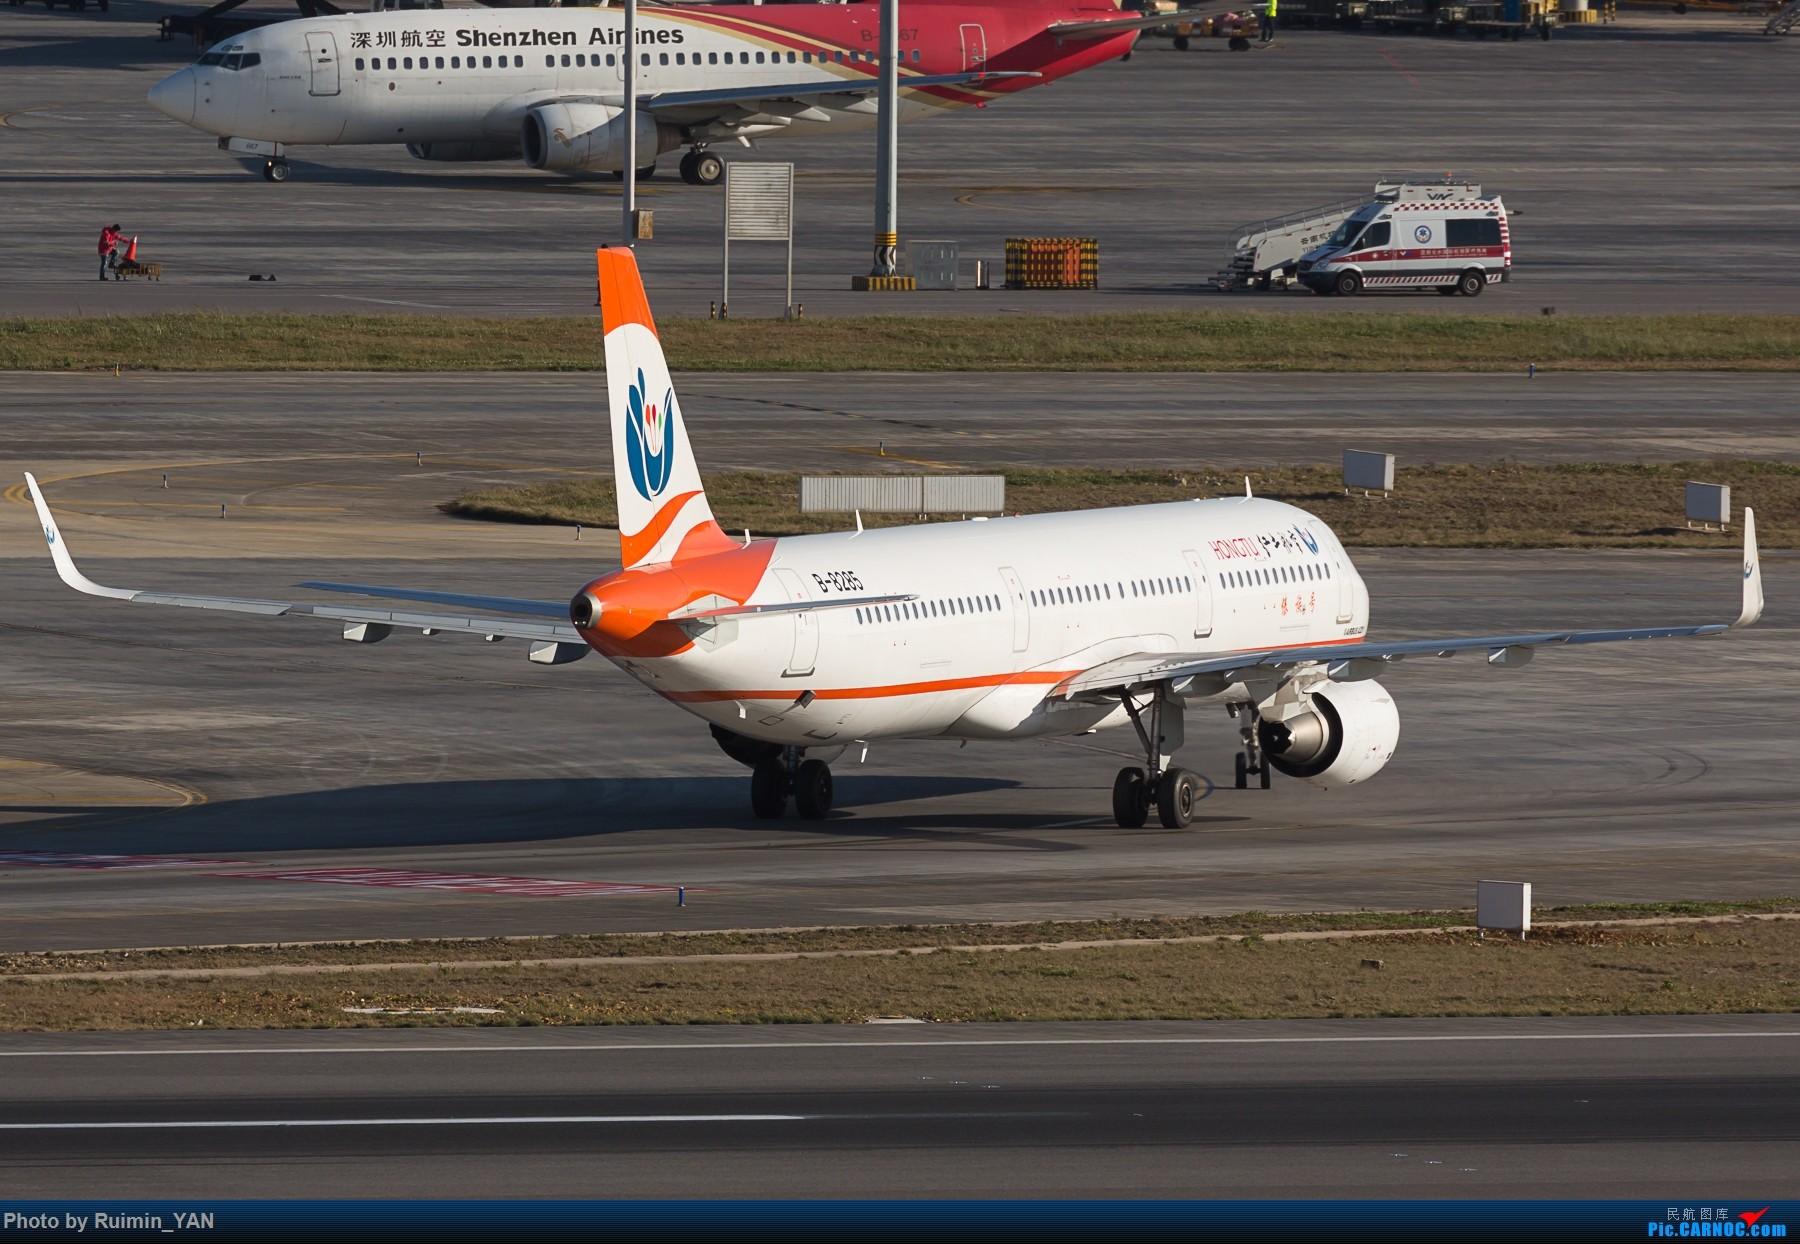 【KMG】红土航空(A6) 傣族号B-8285 傈僳族号B-8318 A321 AIRBUS A321-200 B-8285 中国昆明长水国际机场